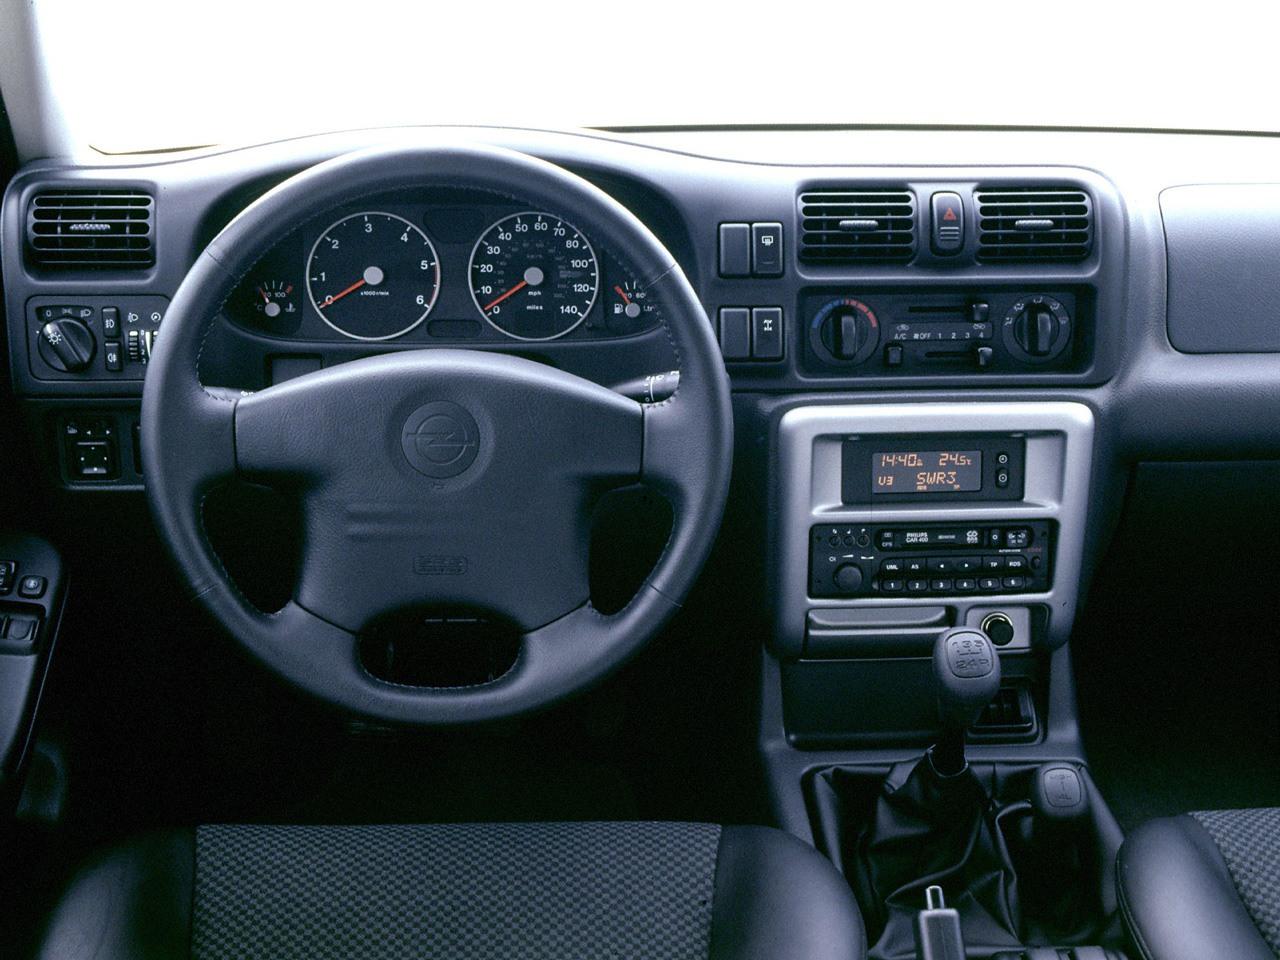 Opel Frontera Limited B 4